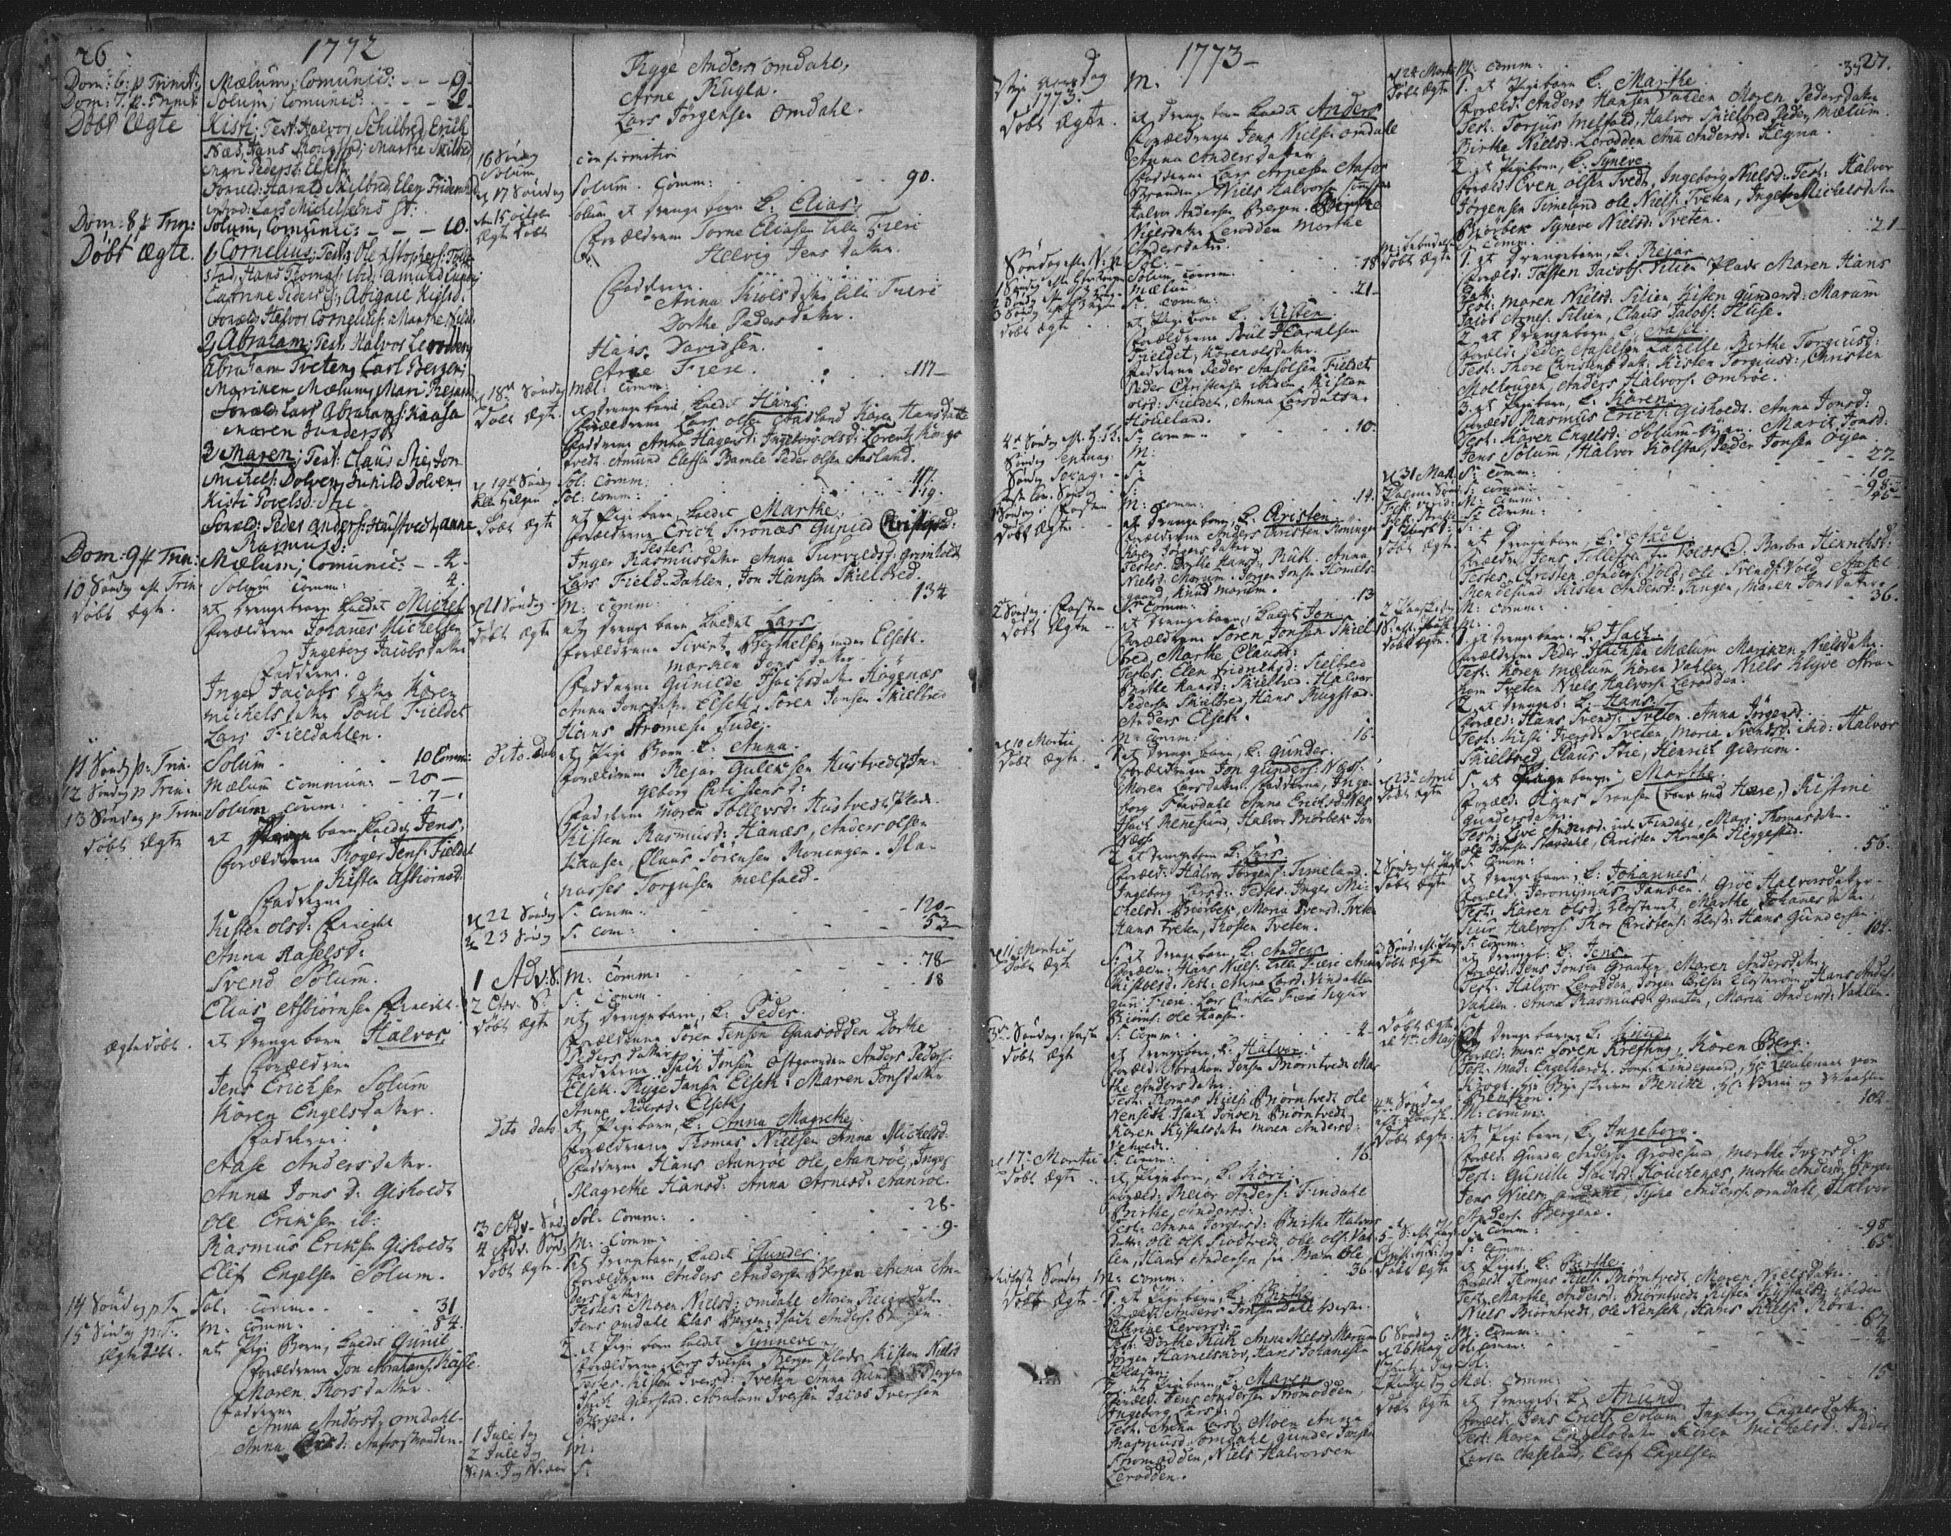 SAKO, Solum kirkebøker, F/Fa/L0003: Ministerialbok nr. I 3, 1761-1814, s. 26-27